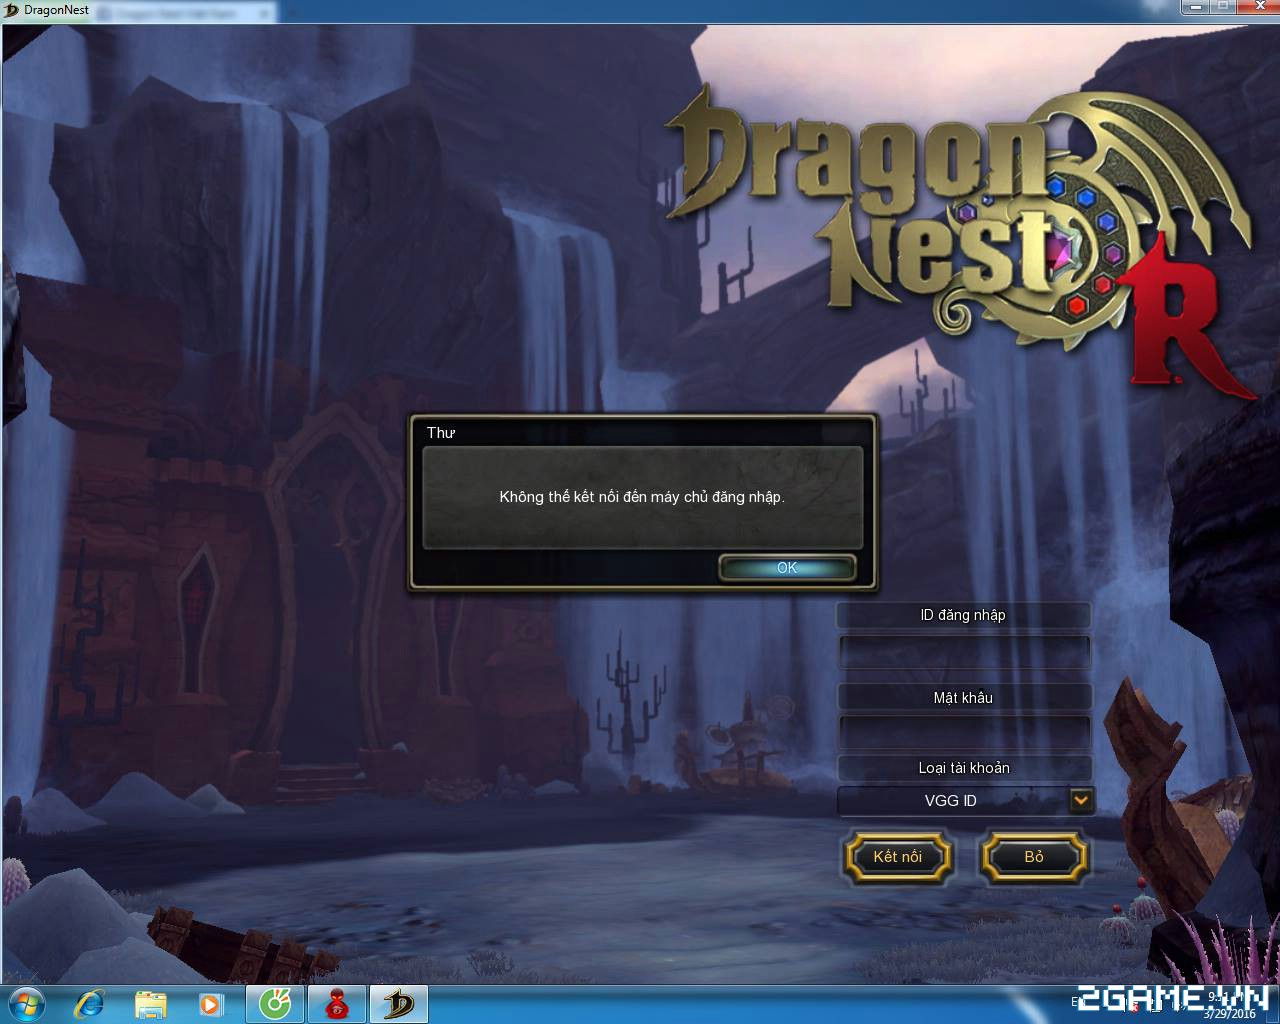 2game_30_3_DragonNest_2.jpg (1280×1024)